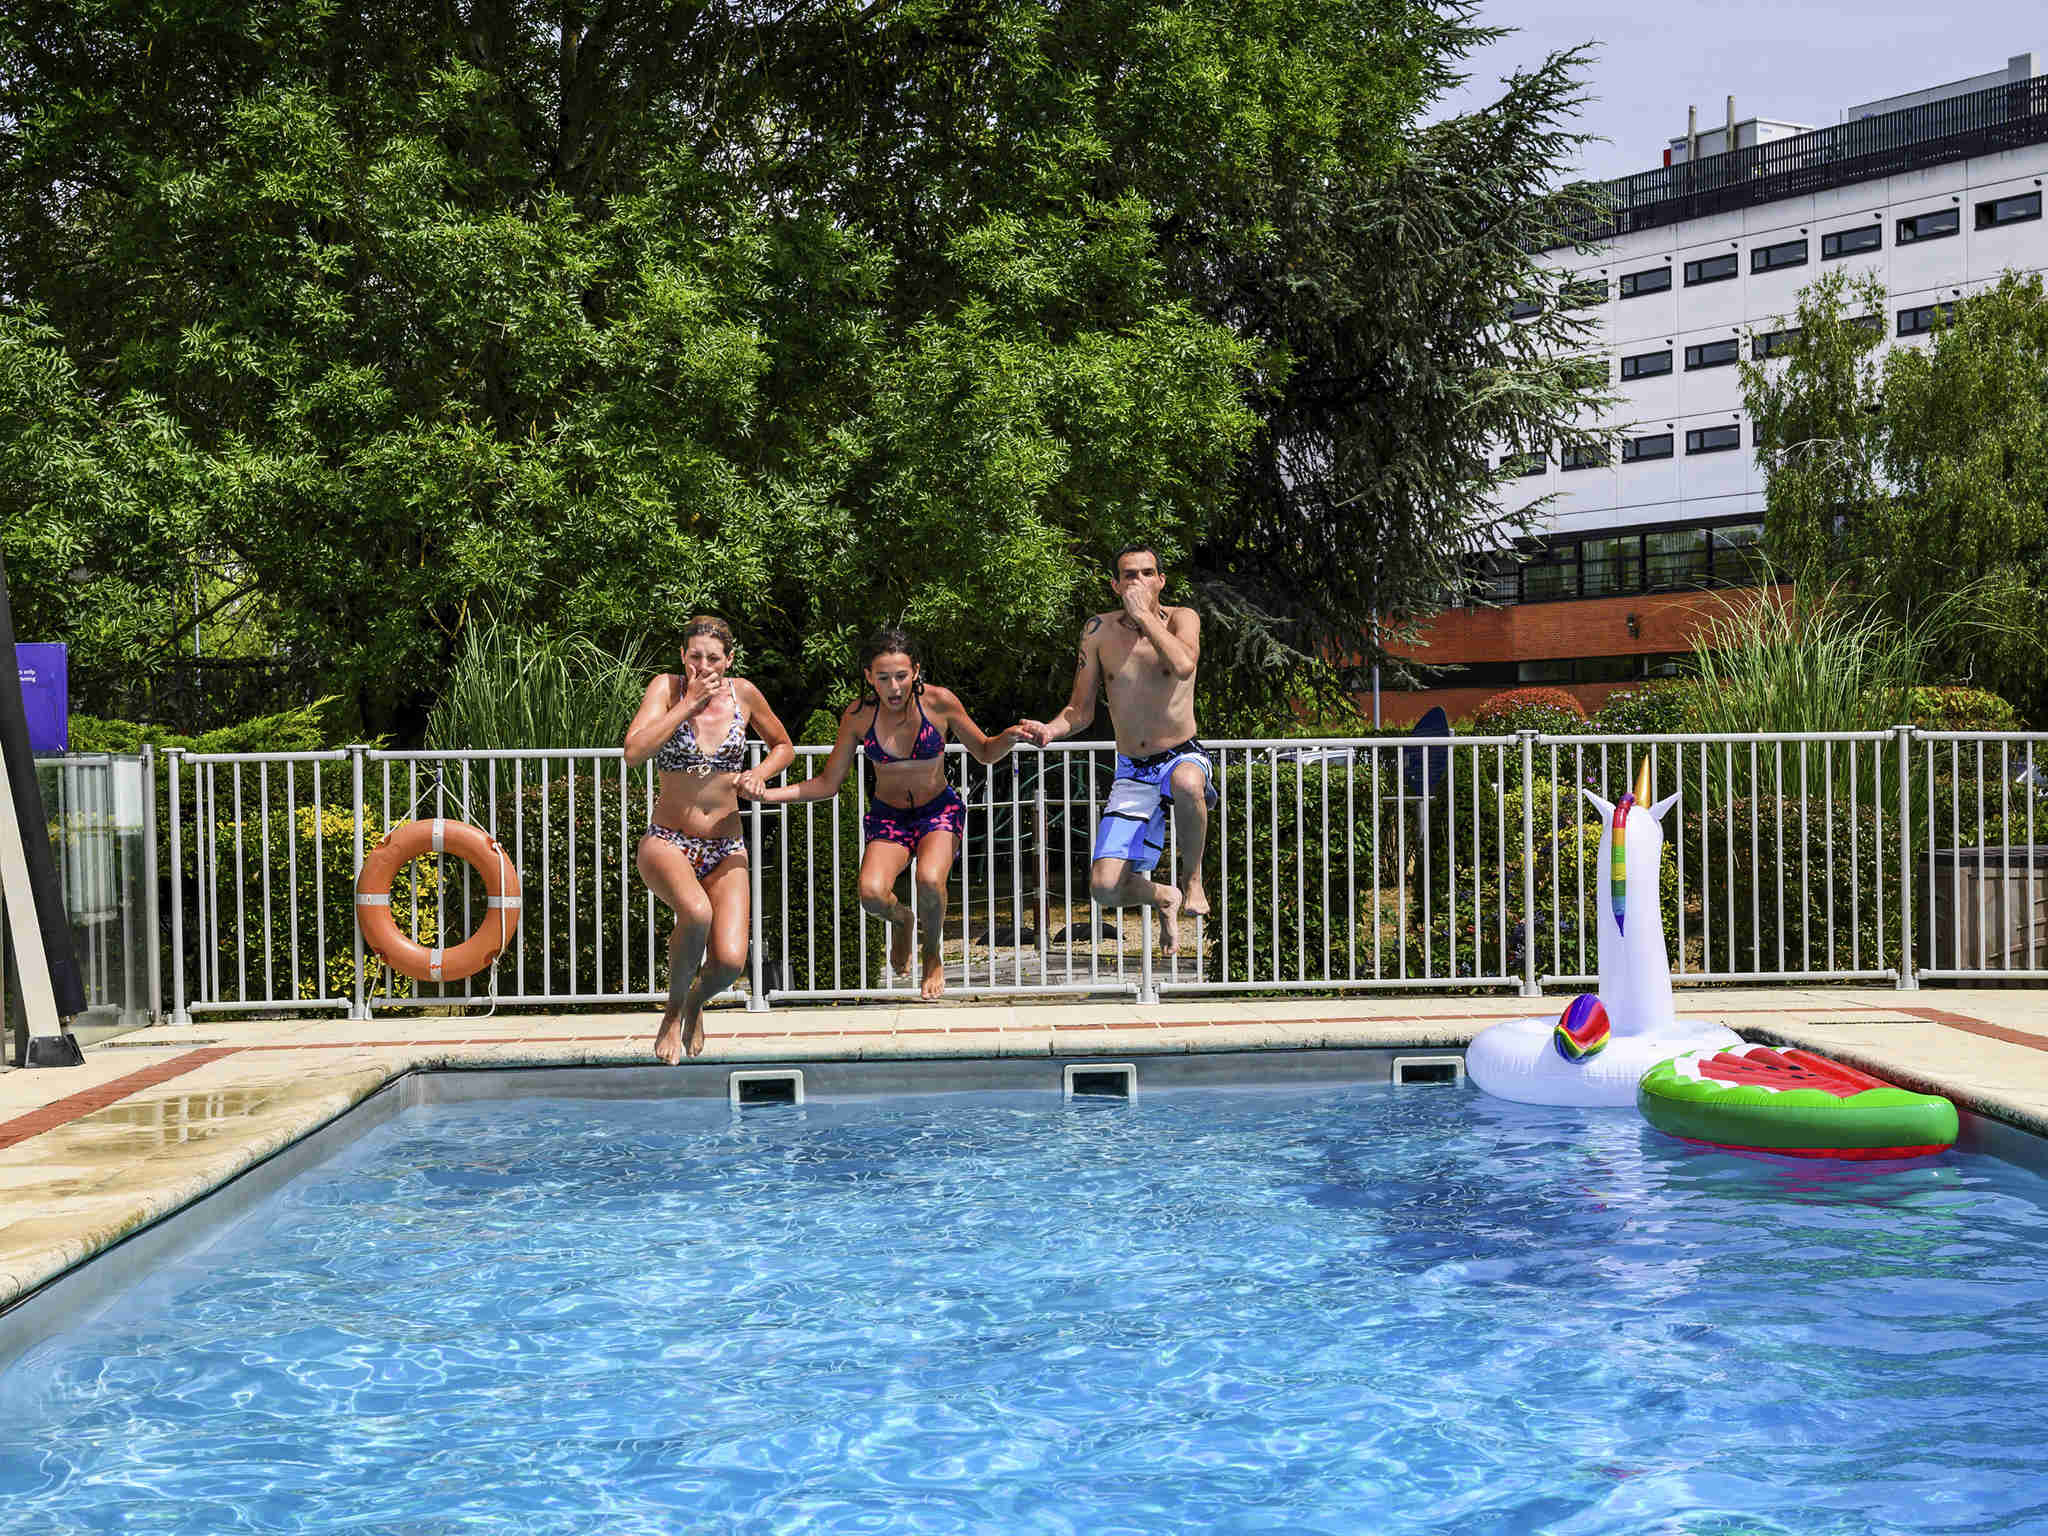 Hotel – Novotel Évry Courcouronnes